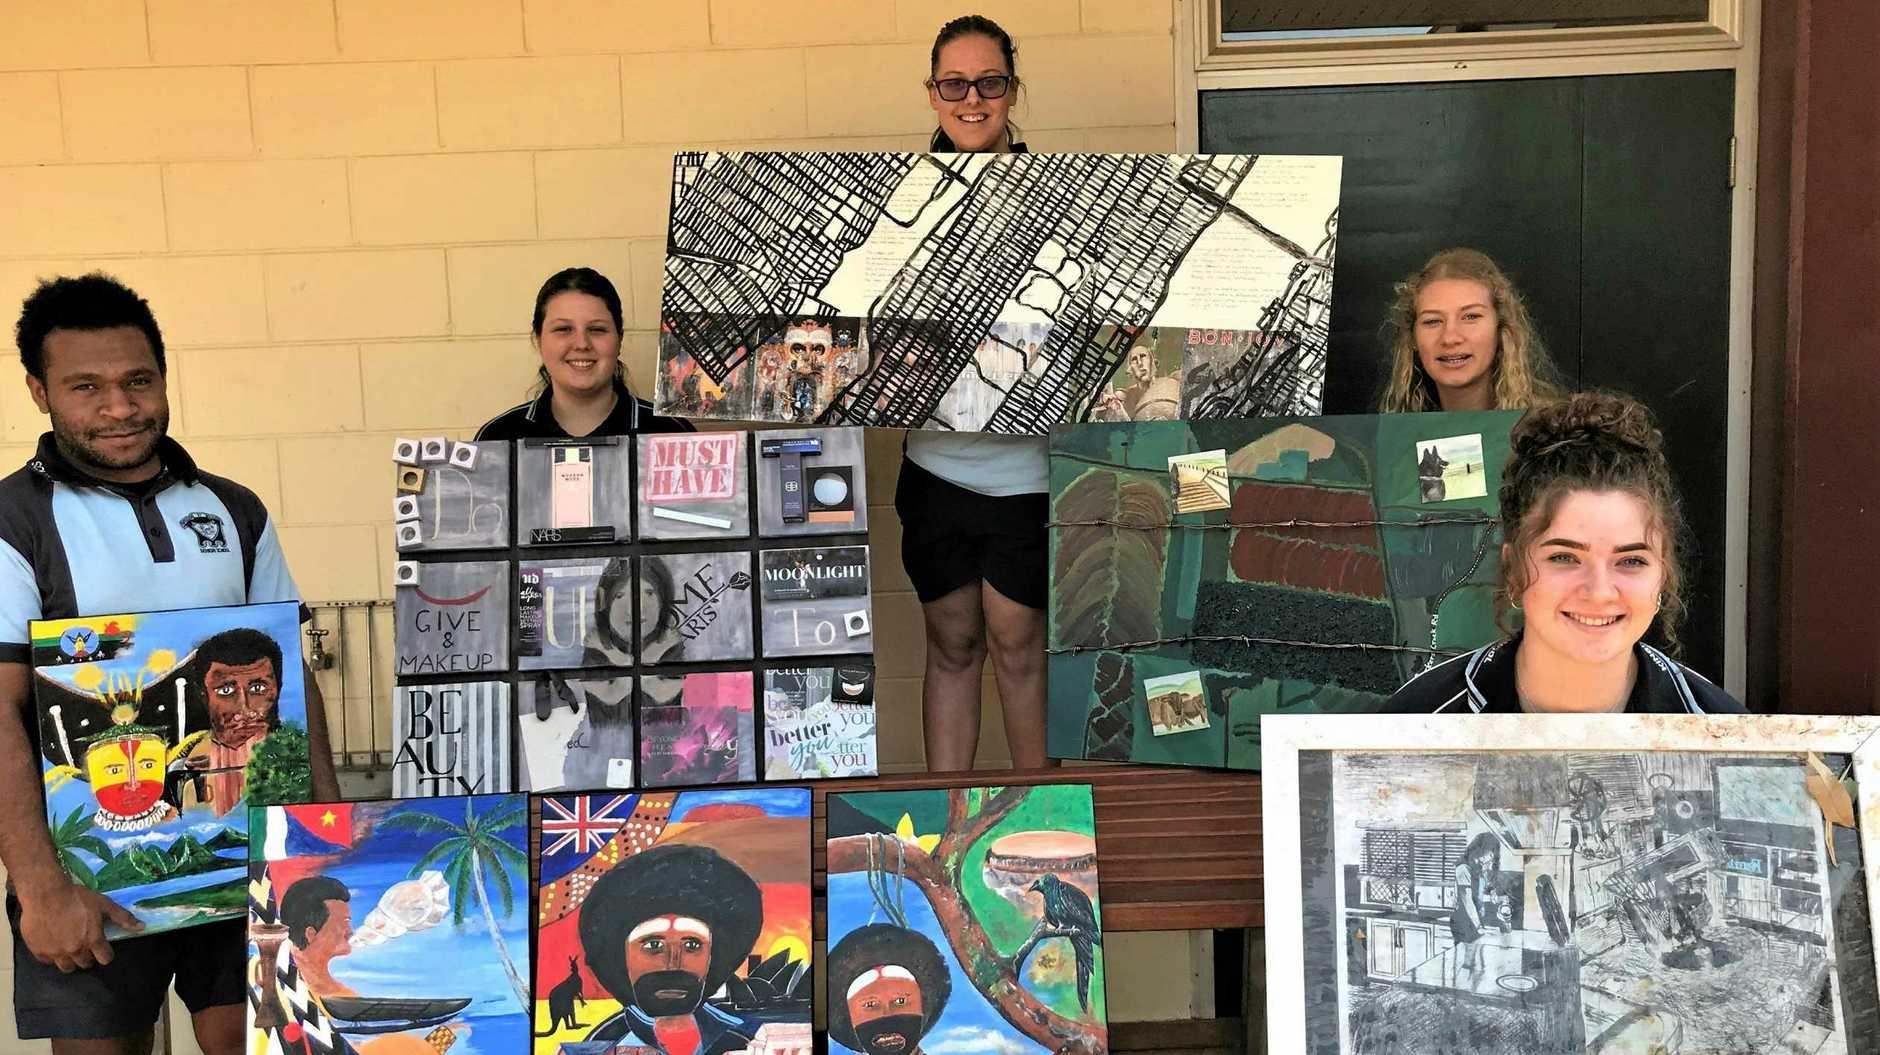 Kingaroy Year 12 students Chendrick Andambo, Megan Frohloff, Ashleigh Lindsay, Tamika Schultz, and Tayla Hayes with their artwork.